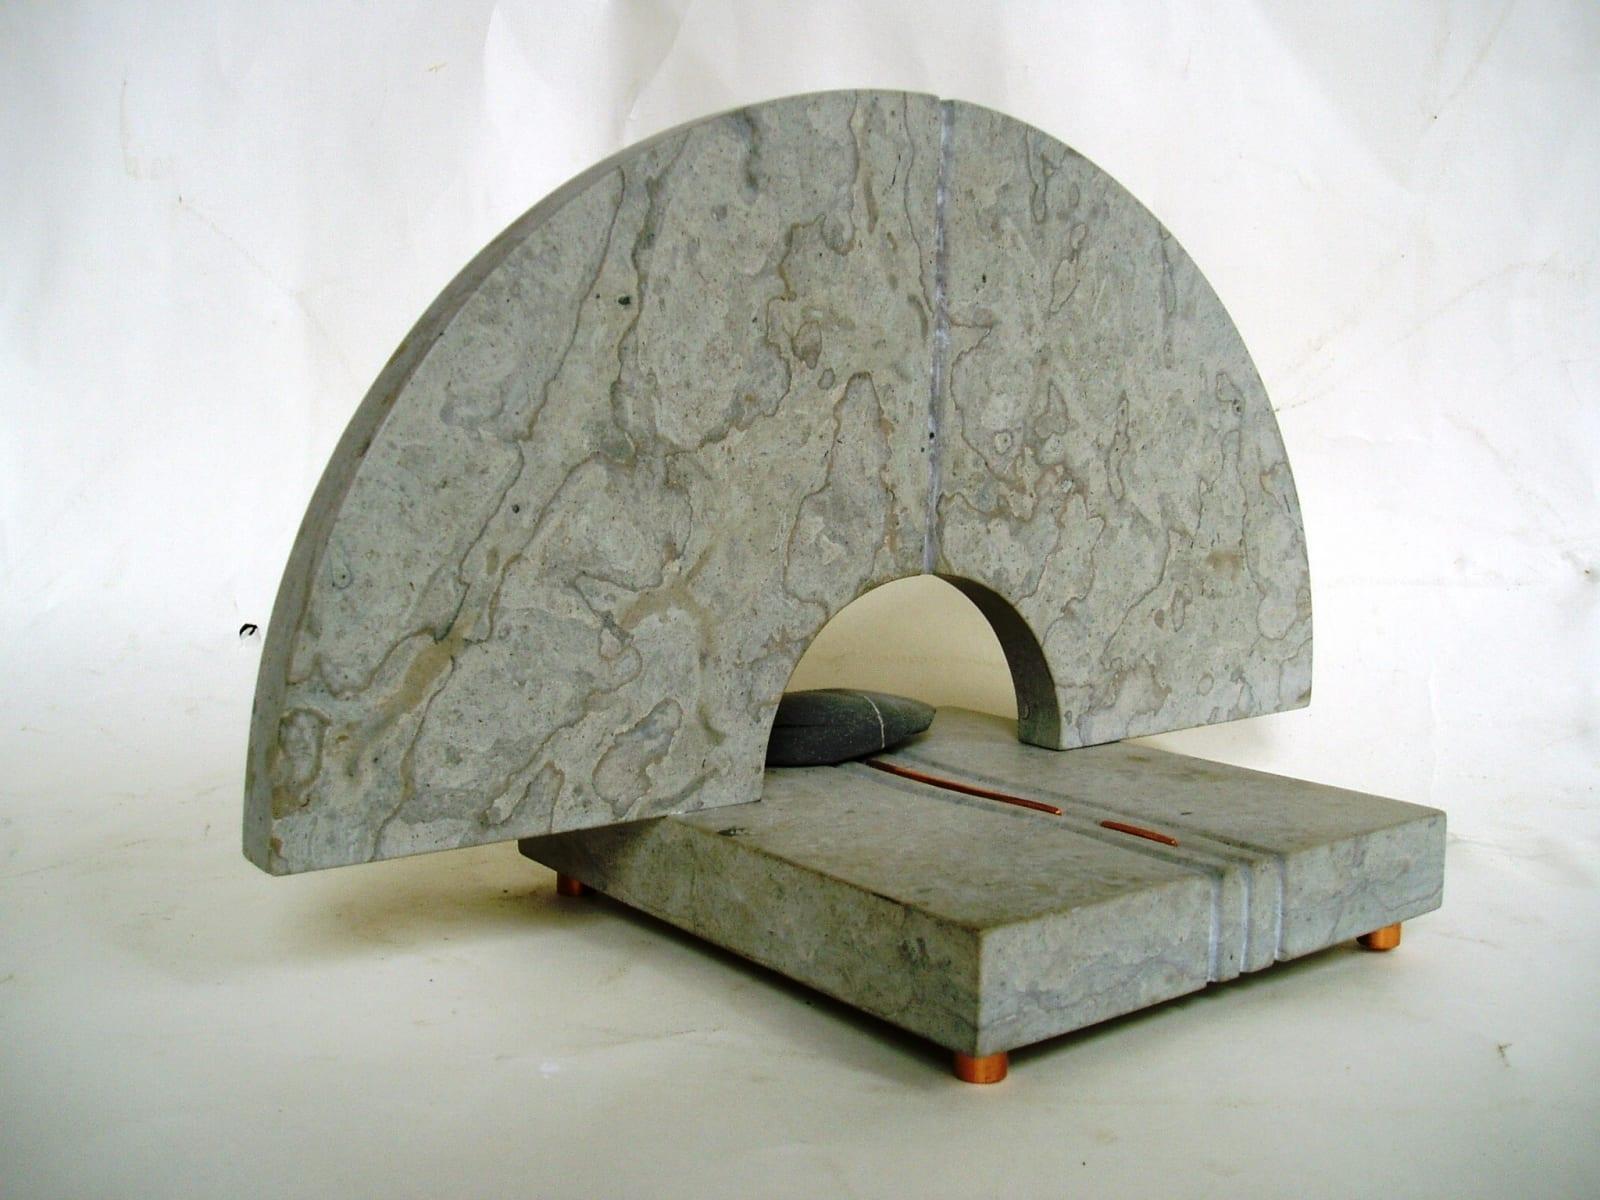 """ELUJÕGI"" 1997 paekivi, pronks, kivi <br/>""A RIVER of LIFE"" 1997 limestone, bronze, stone"